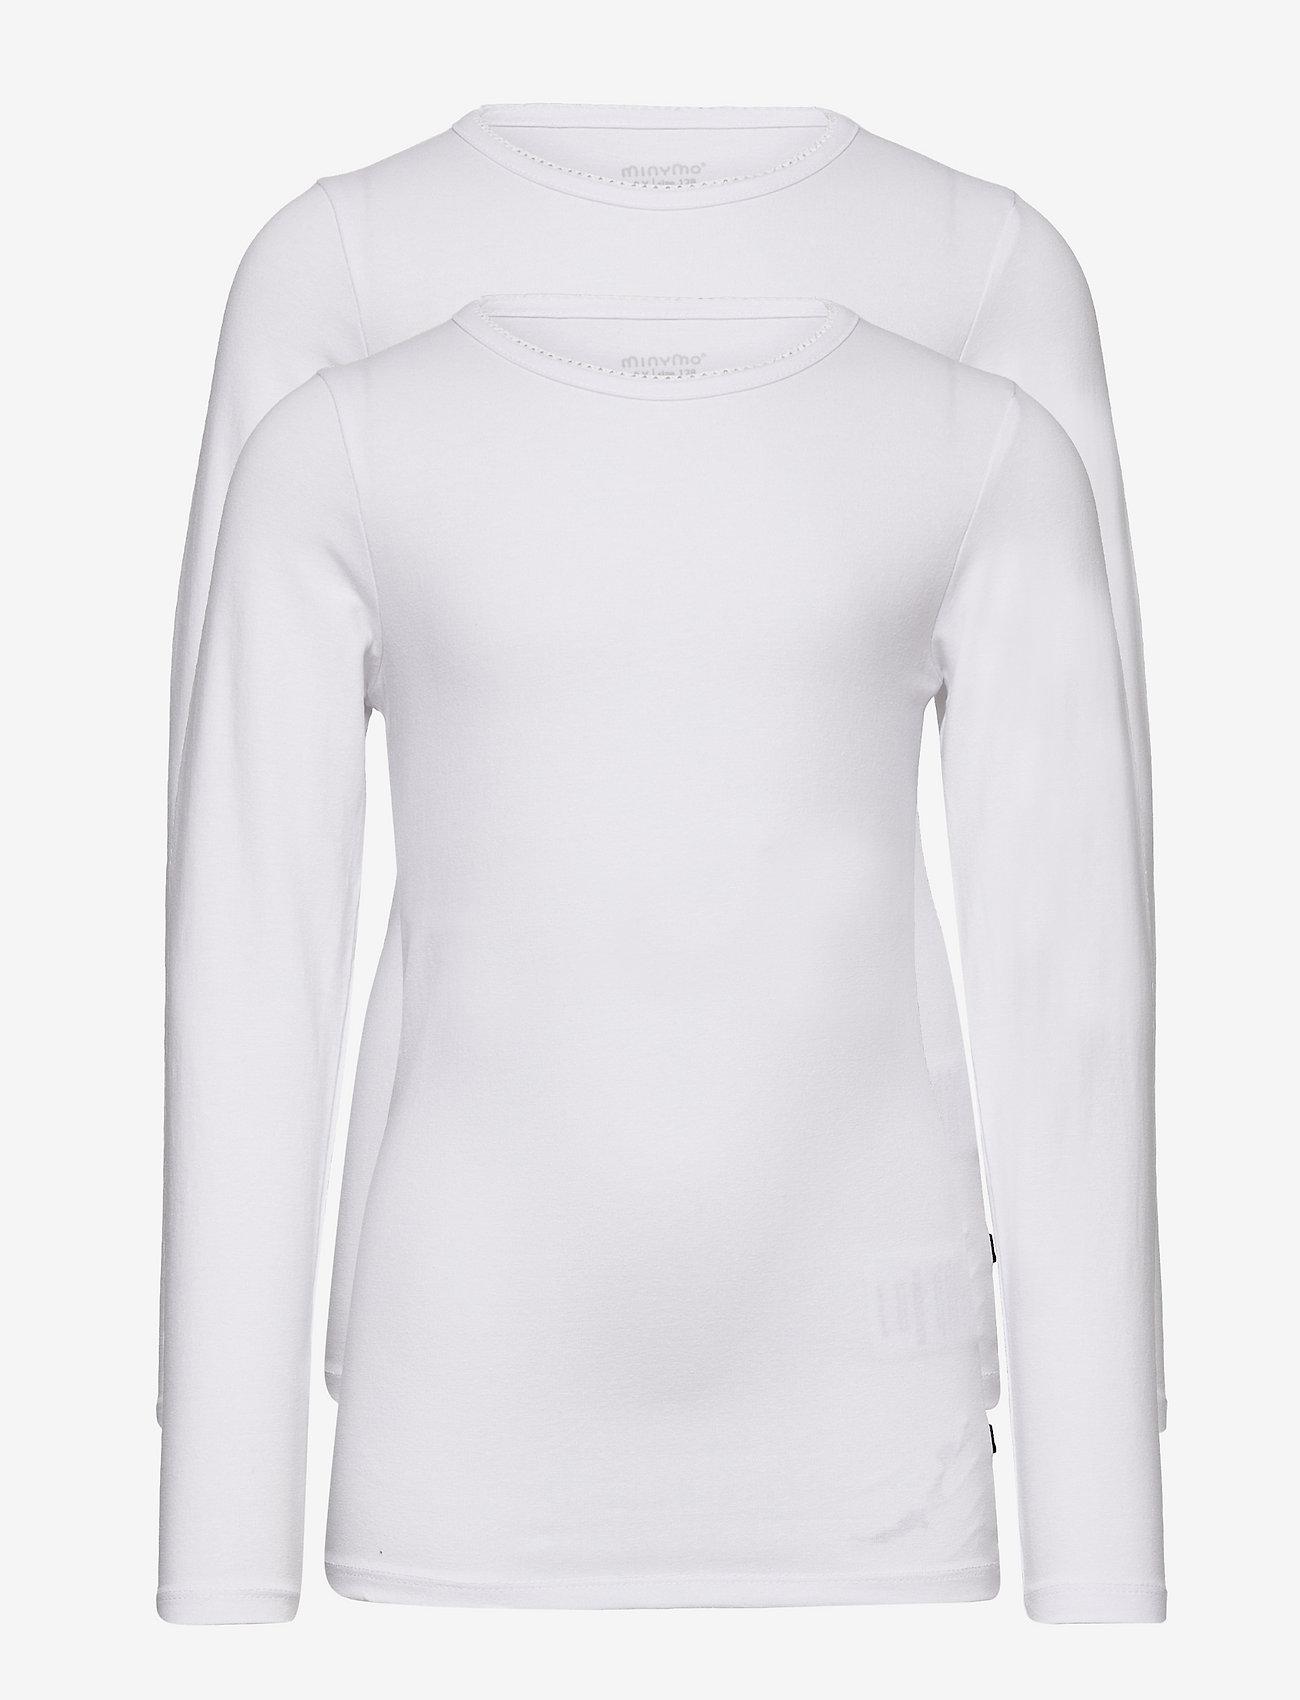 Minymo - Basic 35 -T-shirt LS (2-pack) - t-krekli ar garām piedurknēm - white - 0